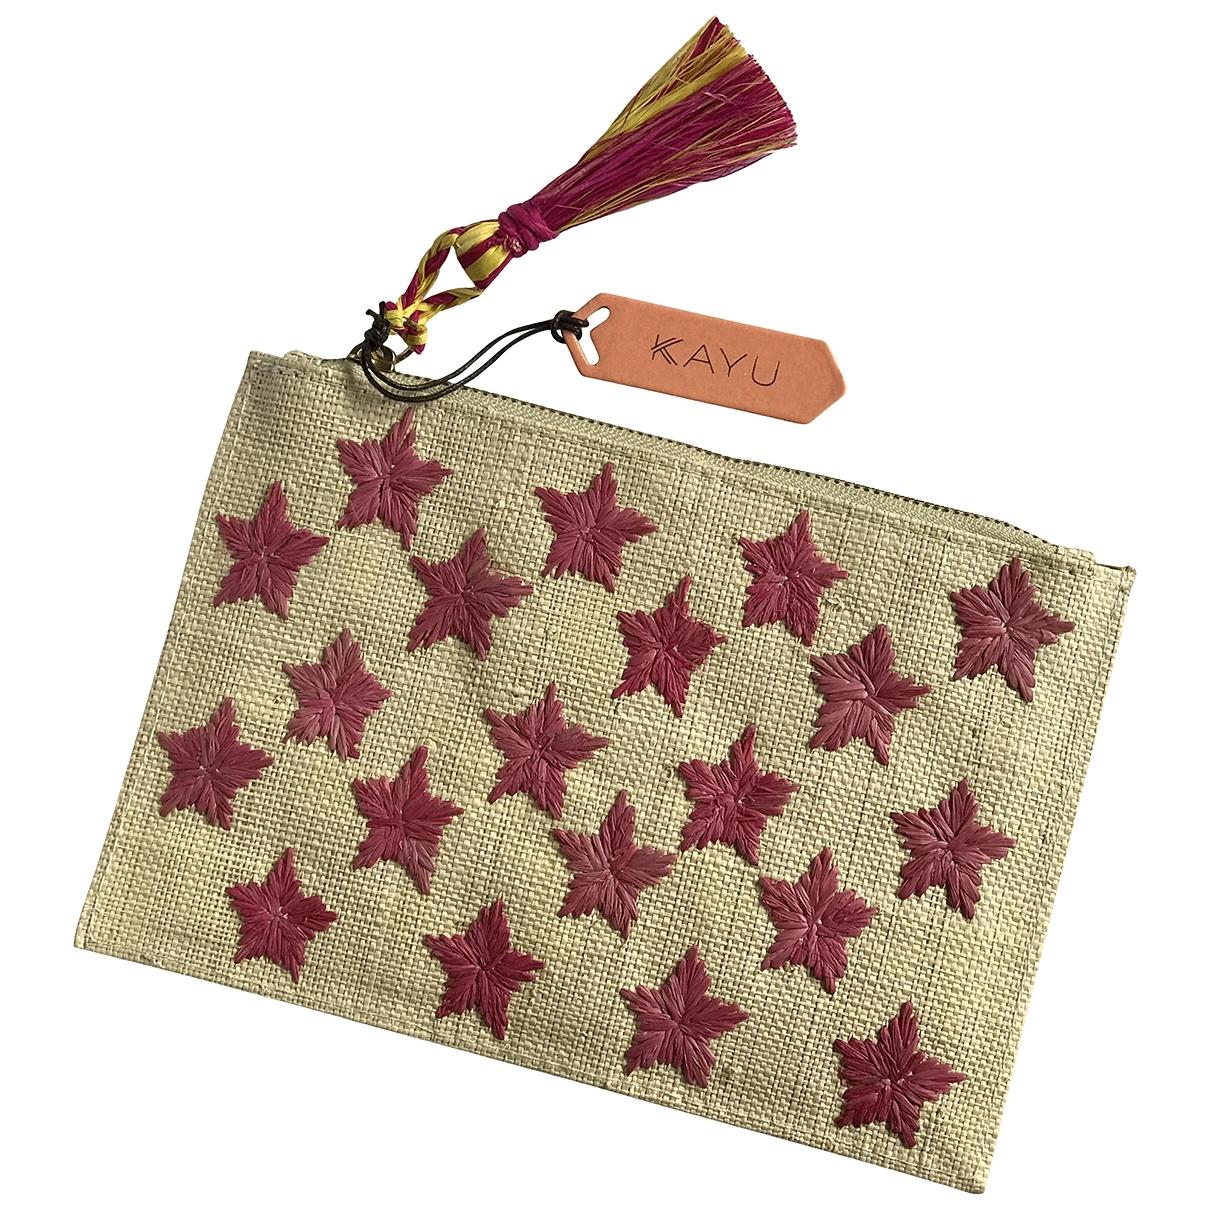 Kayu \N Beige Wicker Clutch bag for Women \N